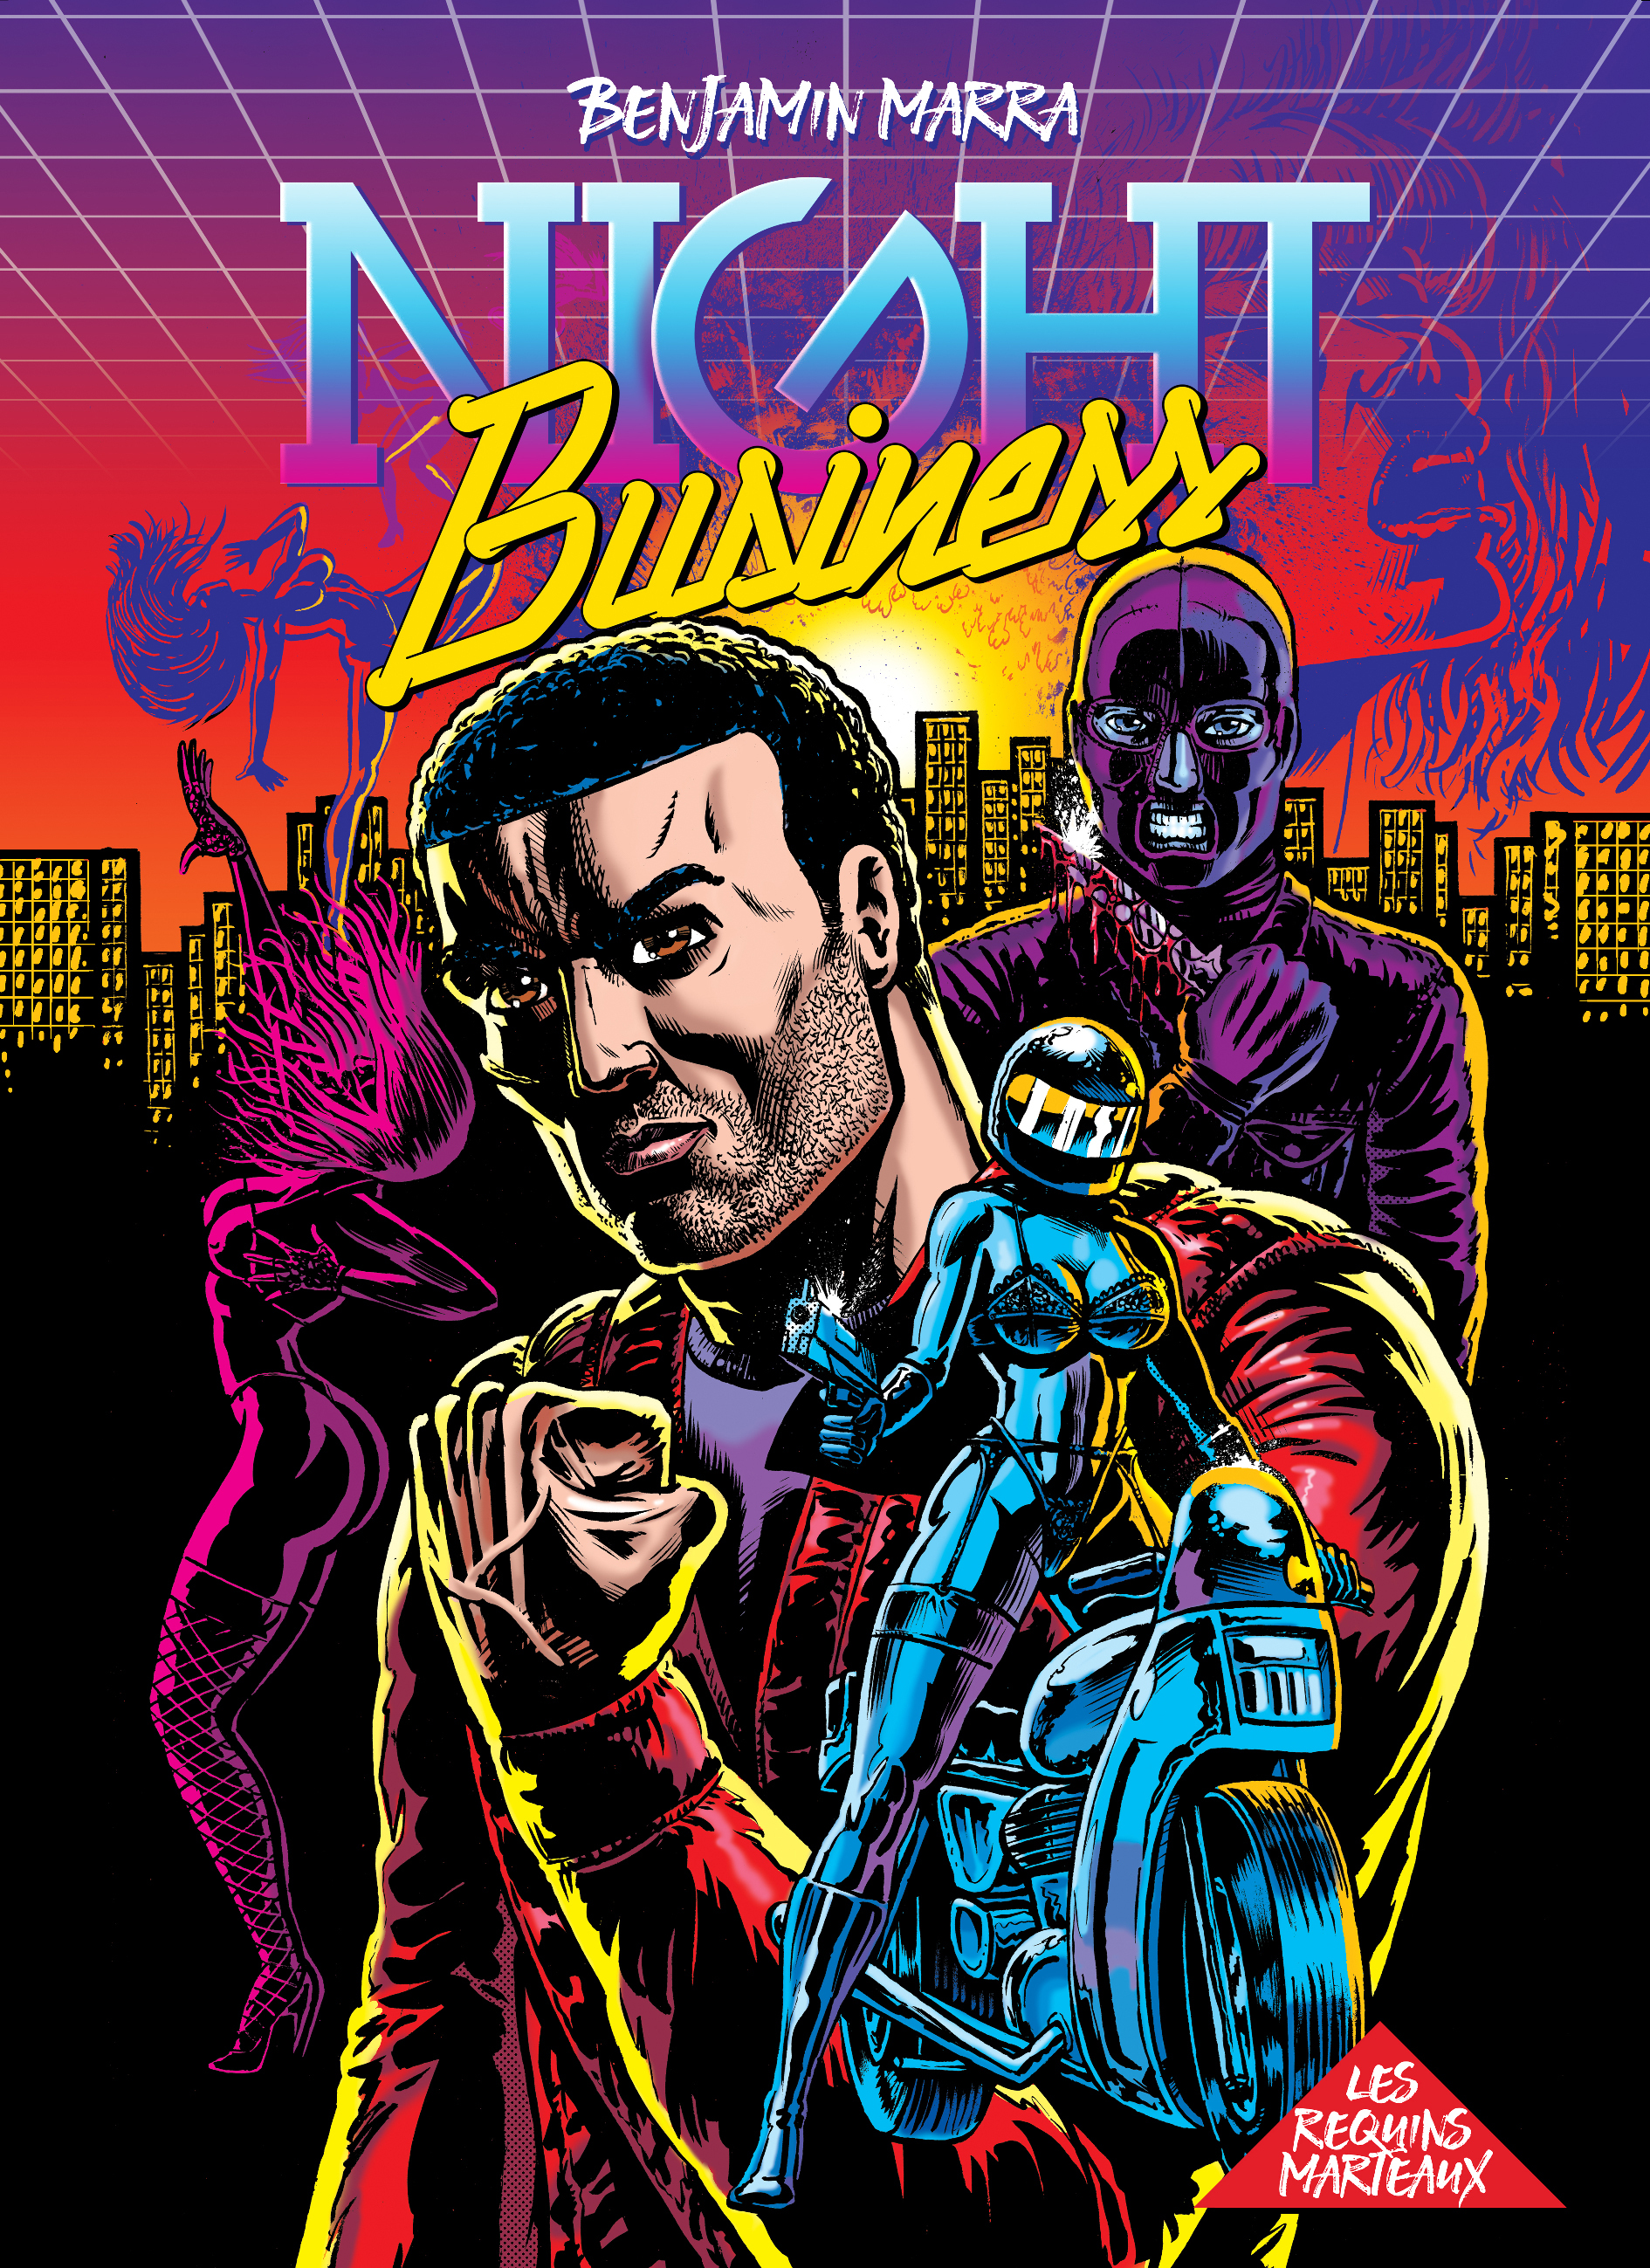 NIGHT BUSINESS